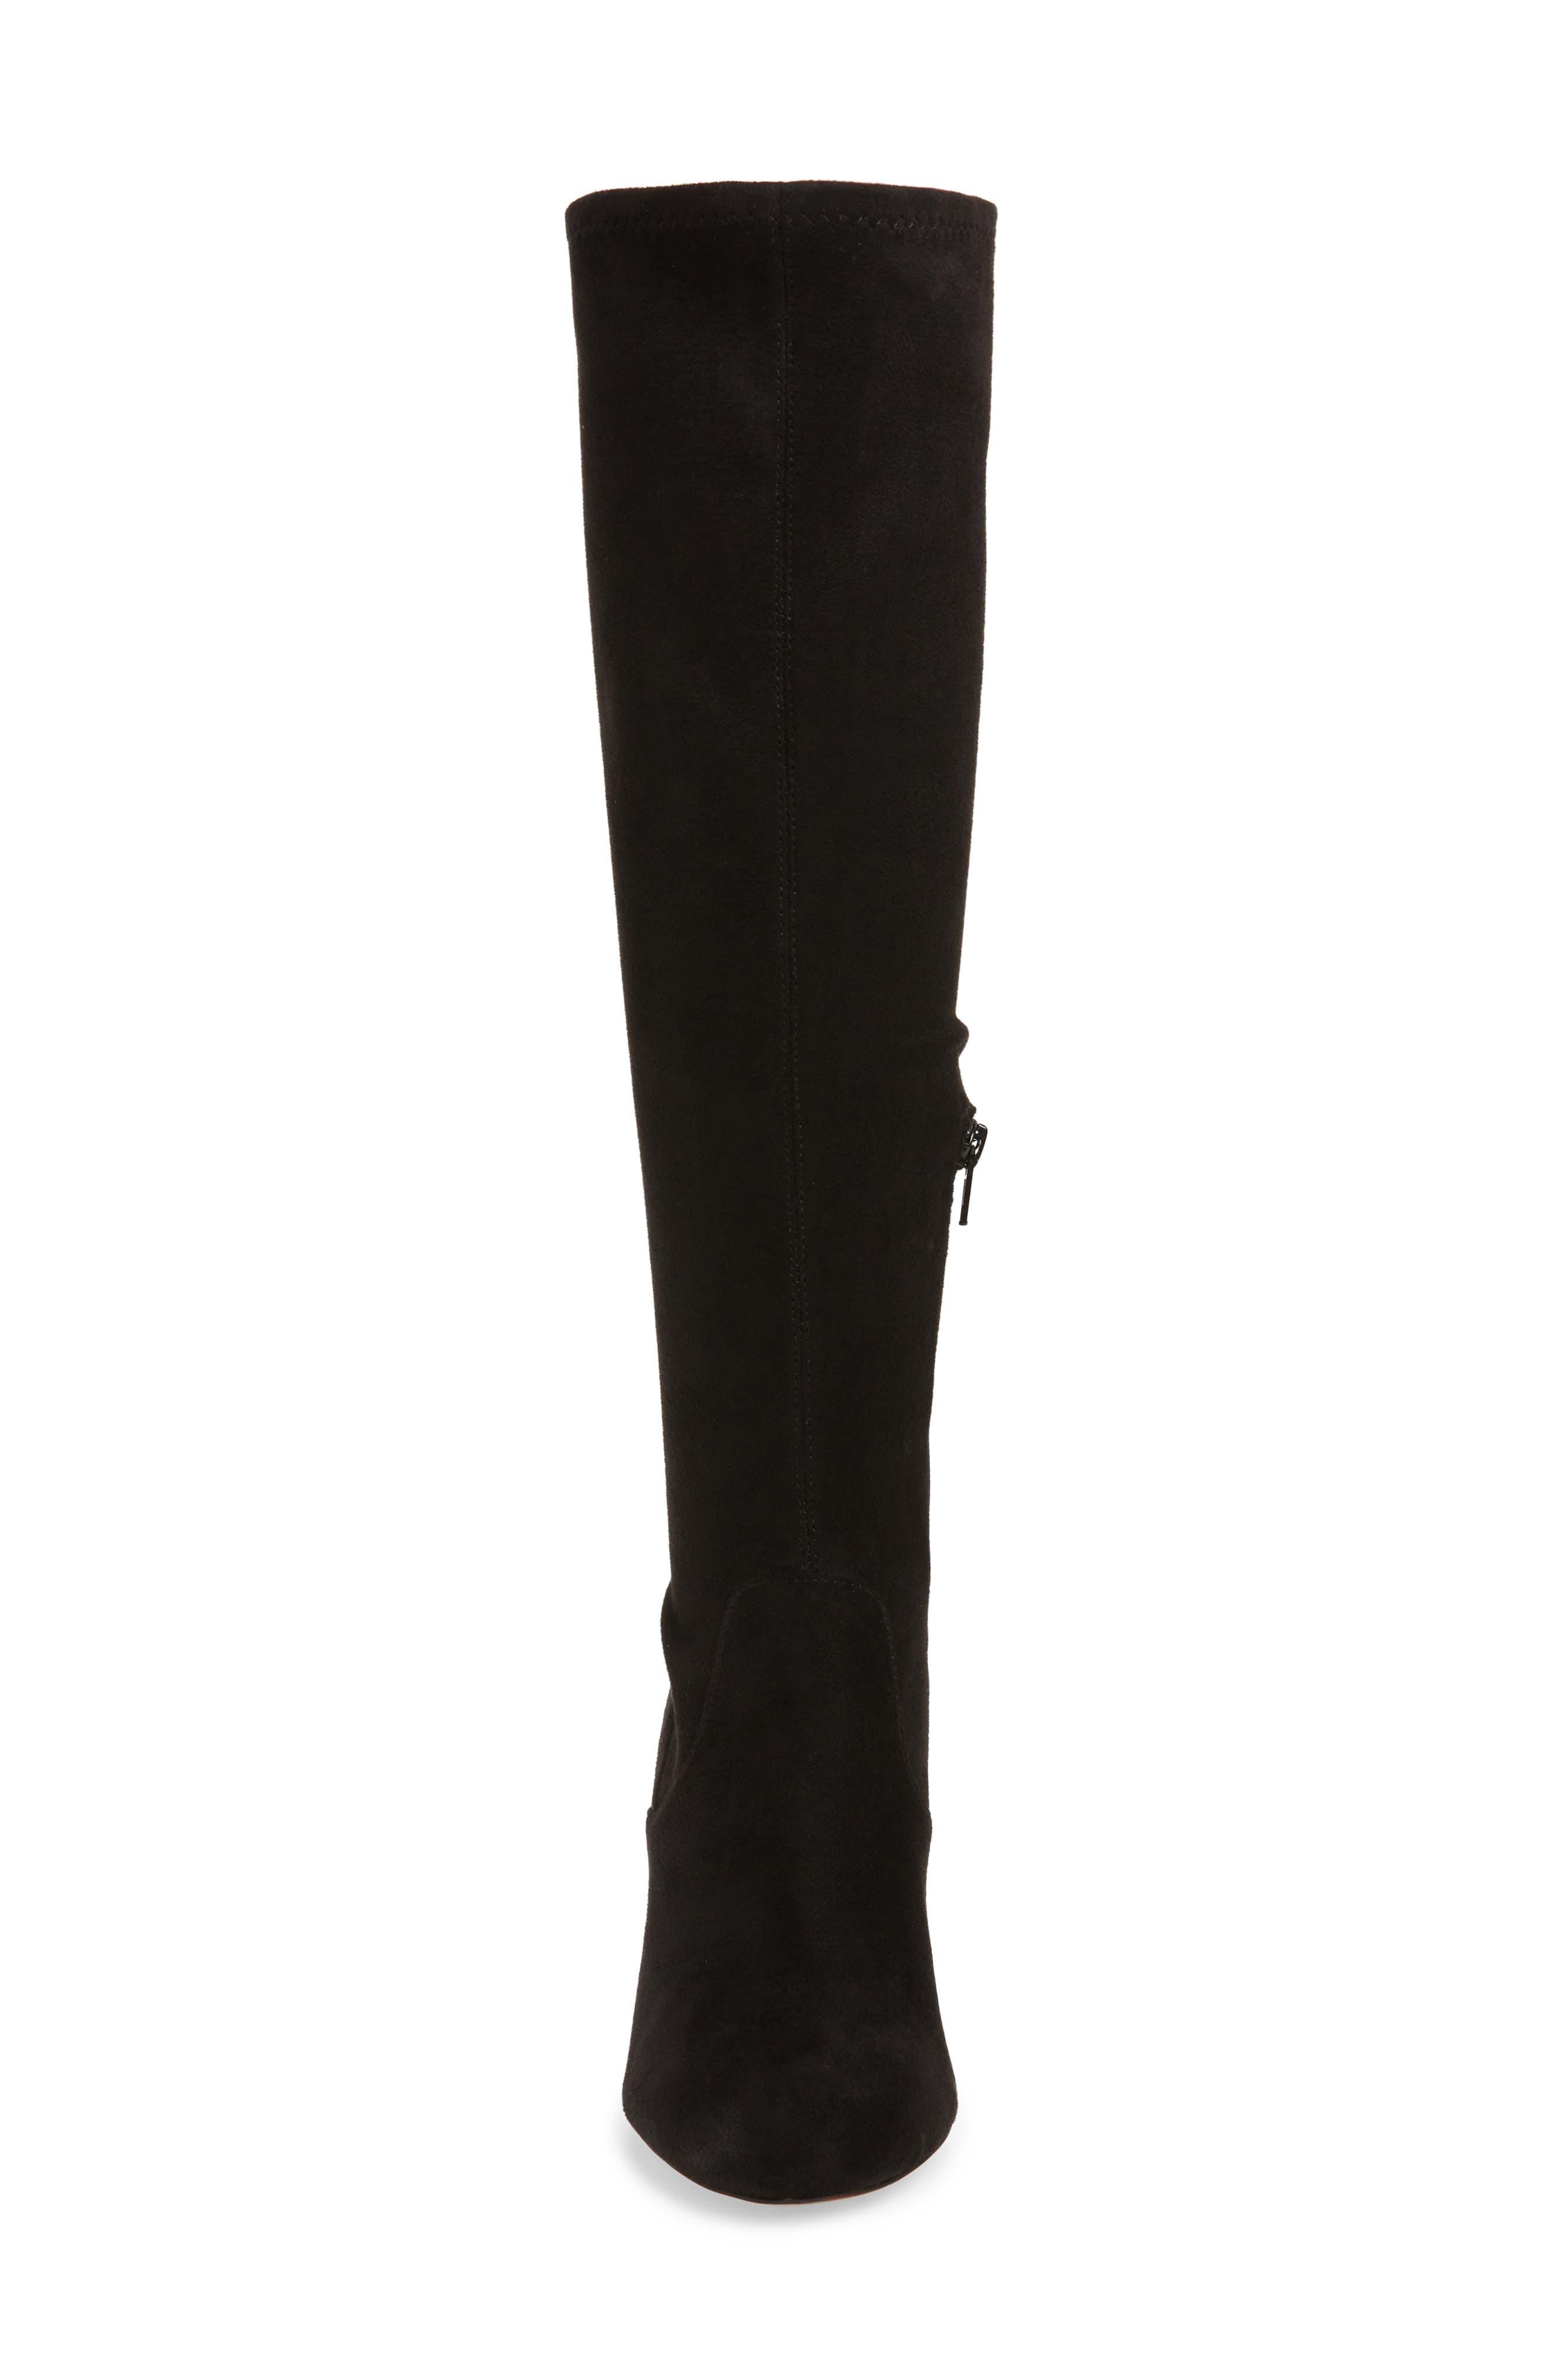 REBECCA MINKOFF, Gillian Knee High Boot, Alternate thumbnail 4, color, 001